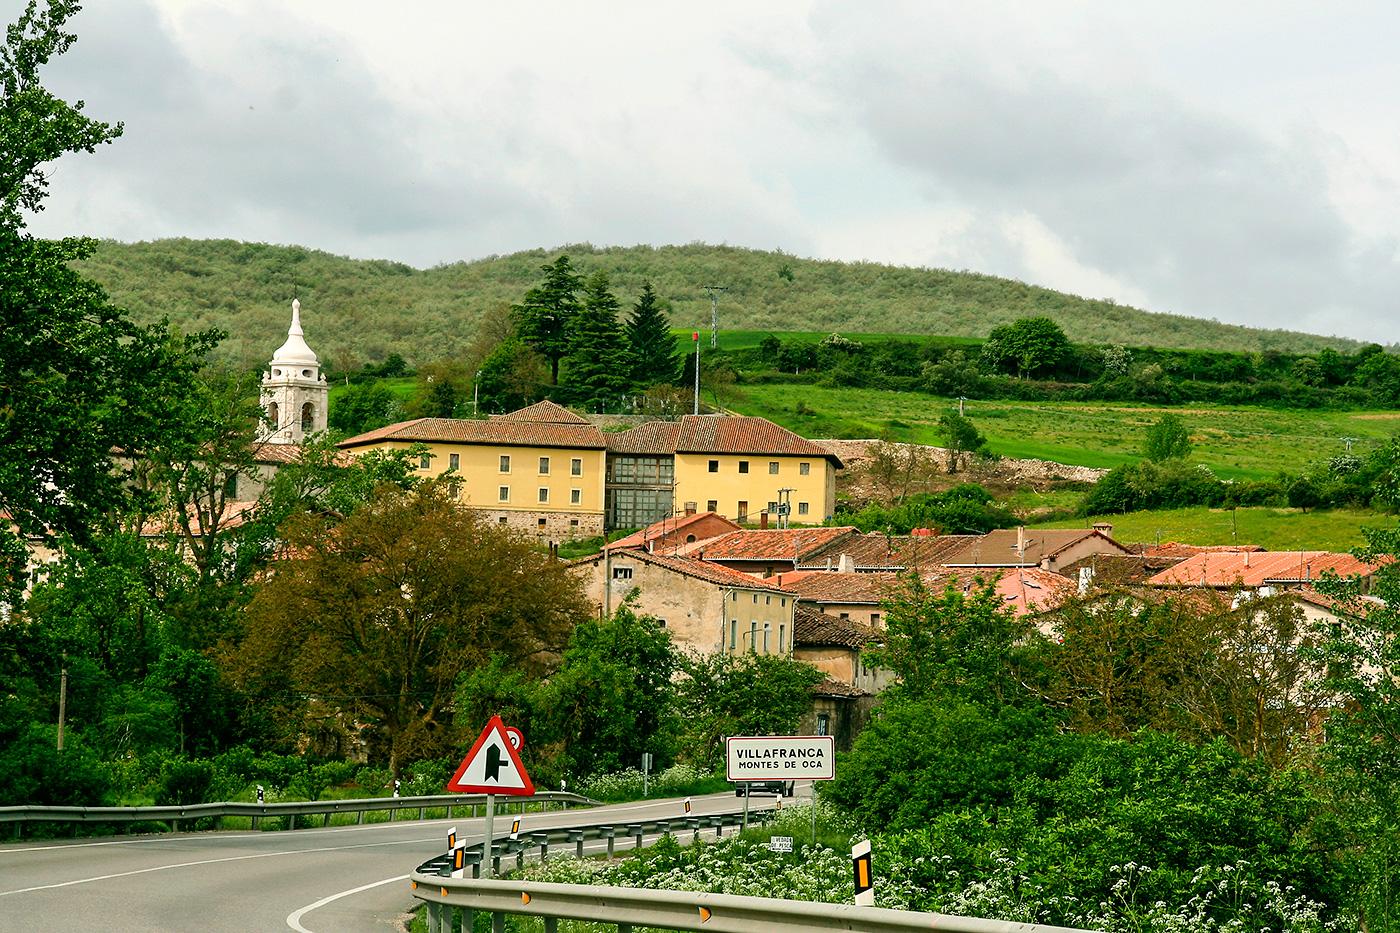 Blick auf Villafranca Montes de Oca